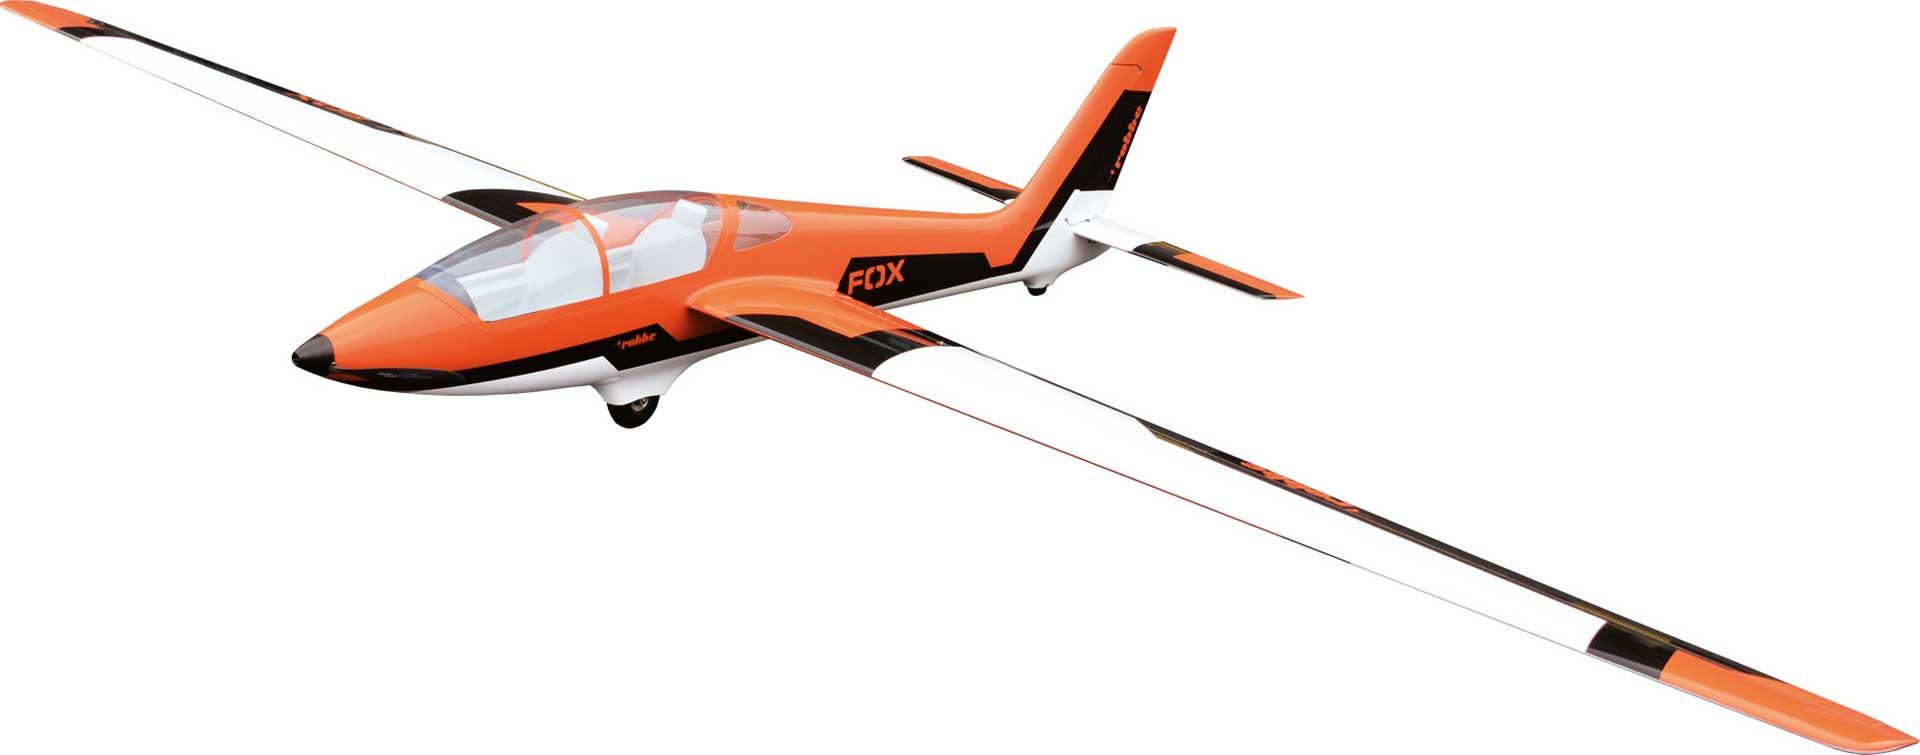 Robbe Modellsport MDM-1 Fox 3,5m glider ARF full GFRP/CFRP painted orange aerobatic glider